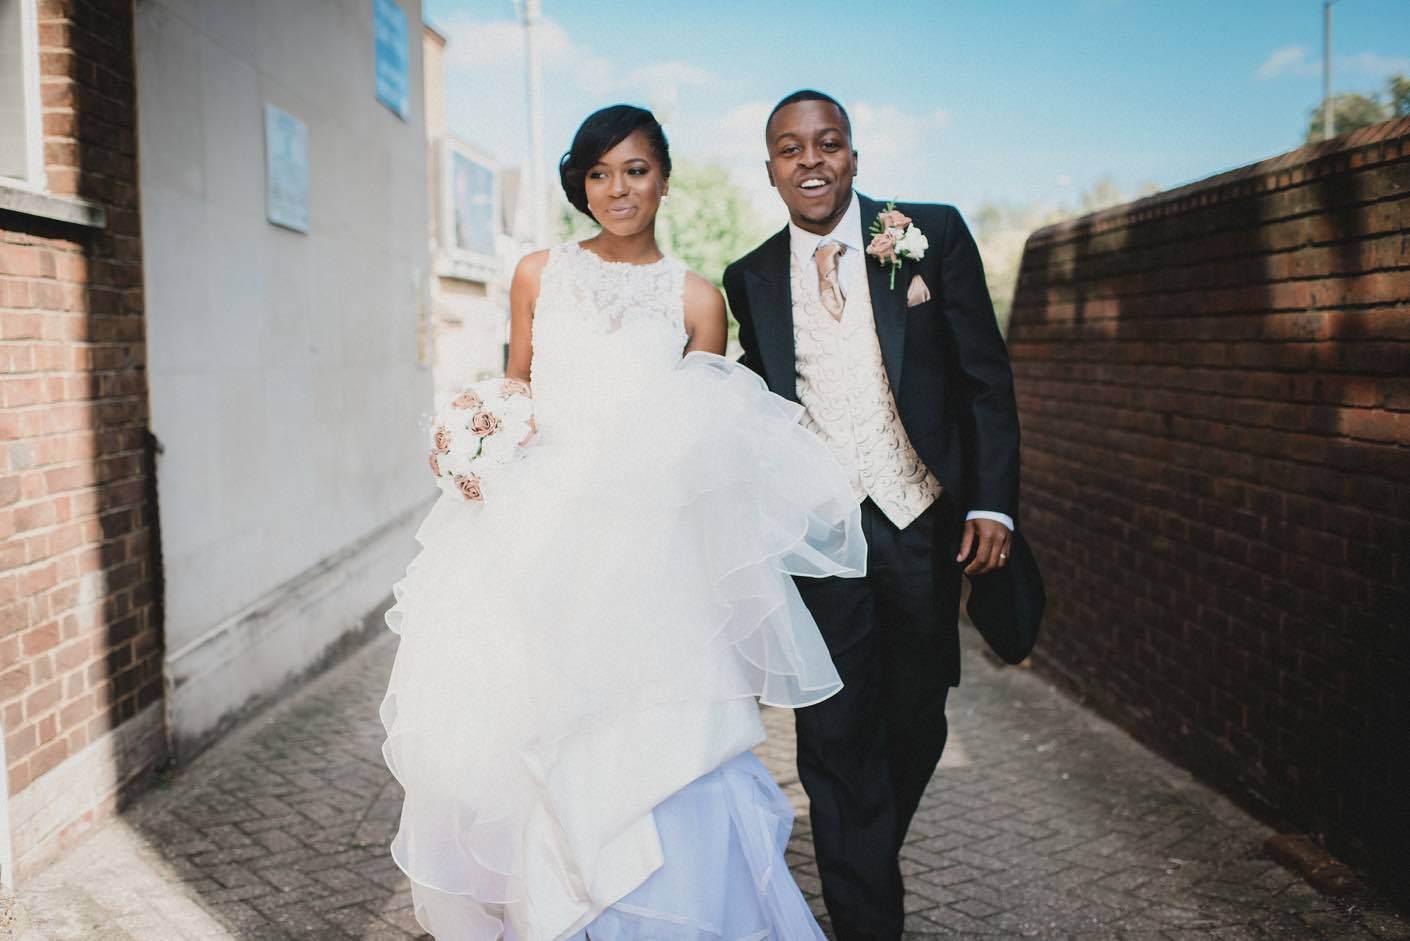 Weddings - DylanJessica 0390 3 by Nasser Gazi London Wedding Photographer